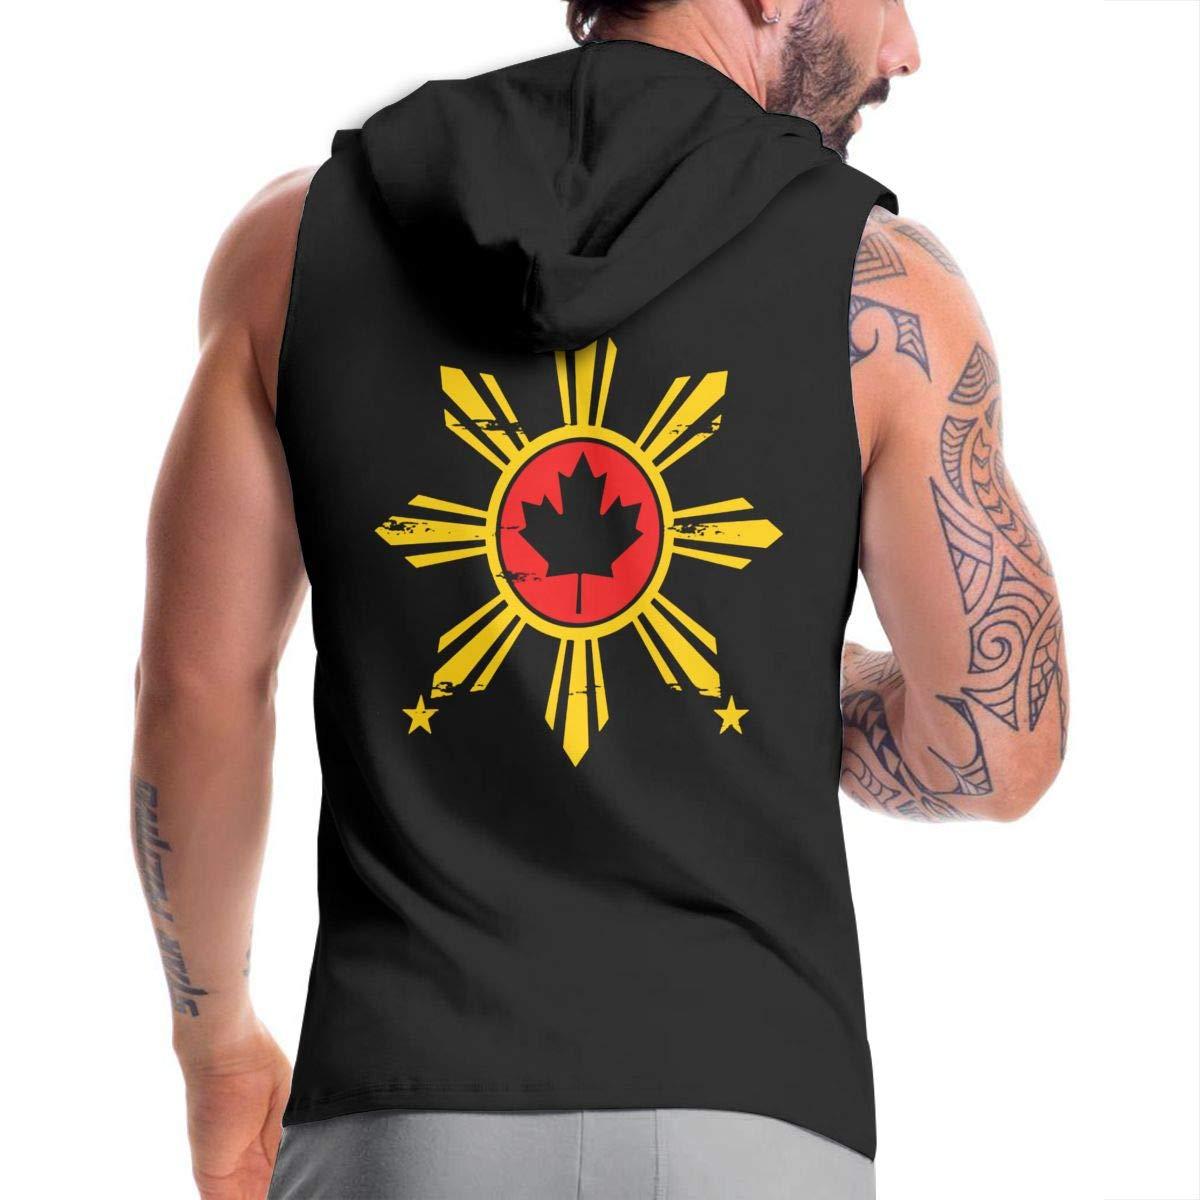 BB/&YYY Filipino Canadian Flag Mens Sleeveless Zipper Fleece Hoodie Active Workout Jacket